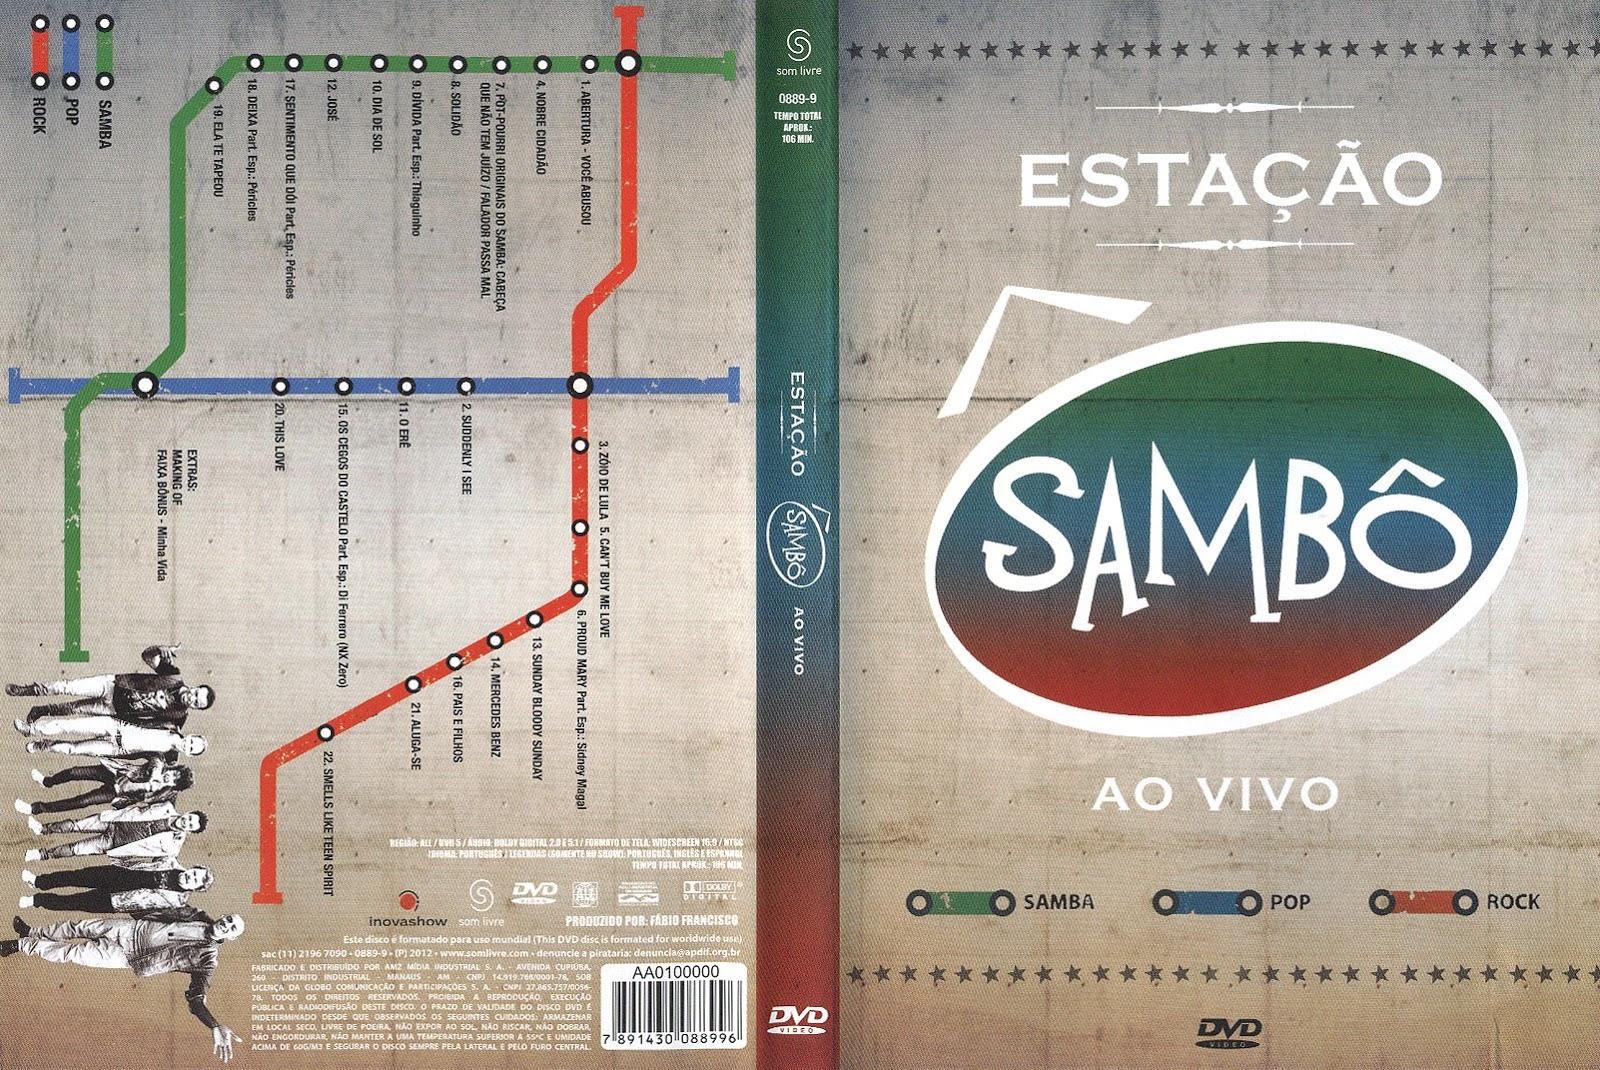 Estação Sambô Estação Sambô esta C3 A7ao sambo